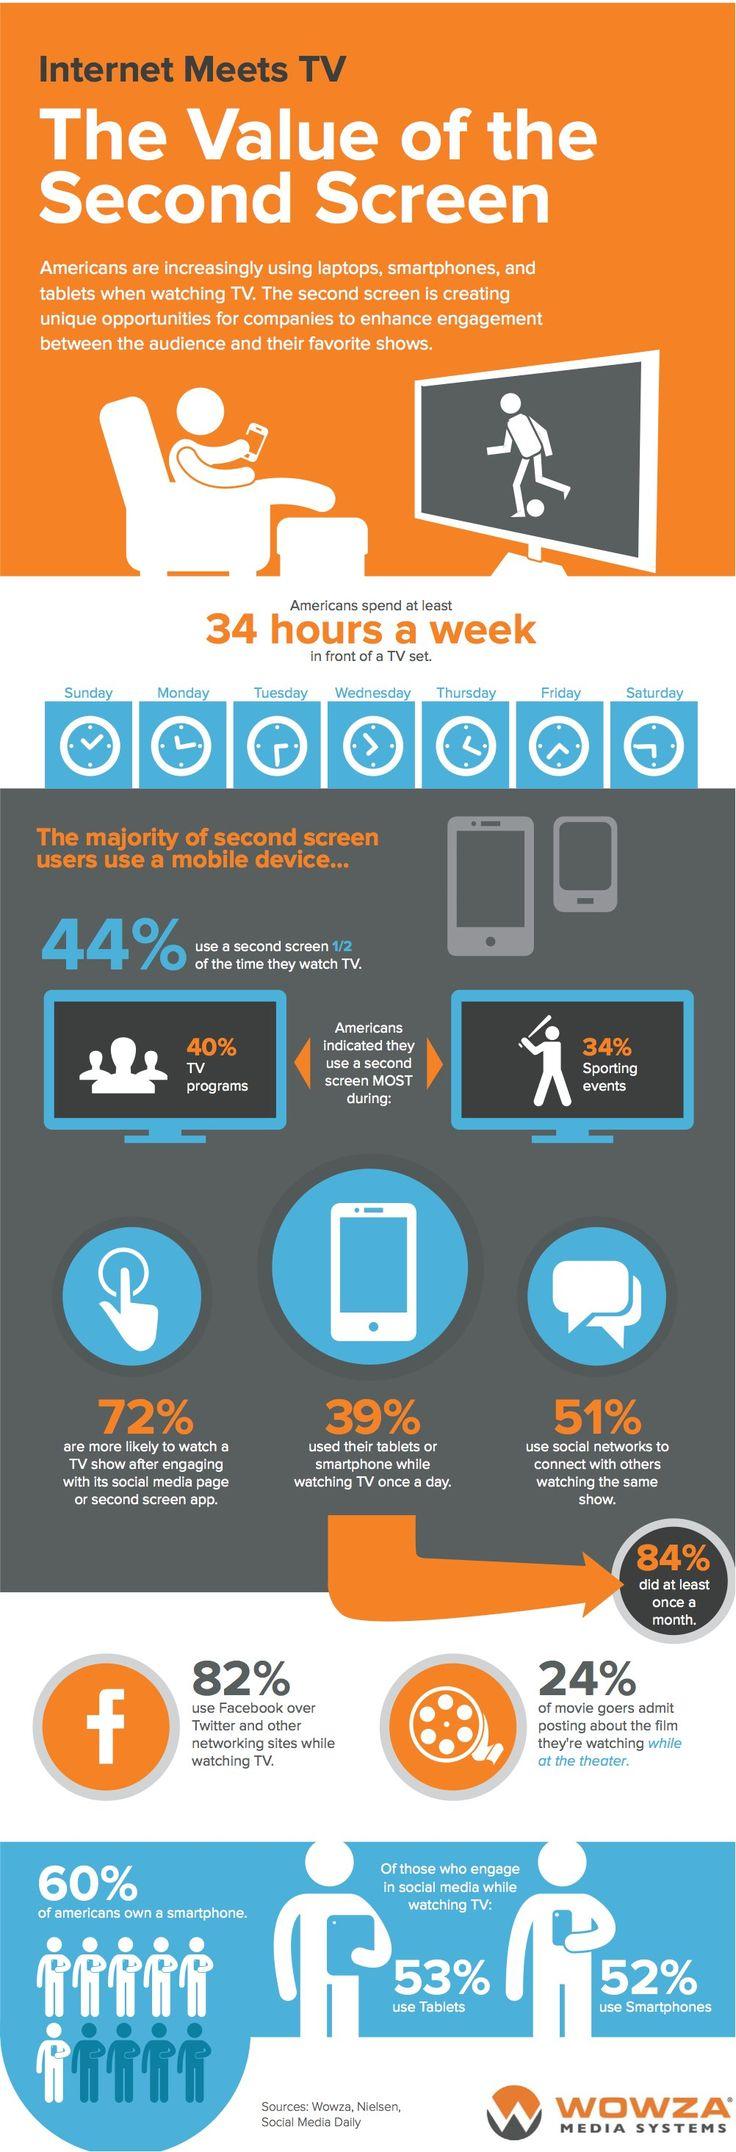 Internet Meets TV - The Value of the Second Screen #socialTV #secondscreen via @AllTwitter - http://www.mediabistro.com/alltwitter/value-second-screen_b51567